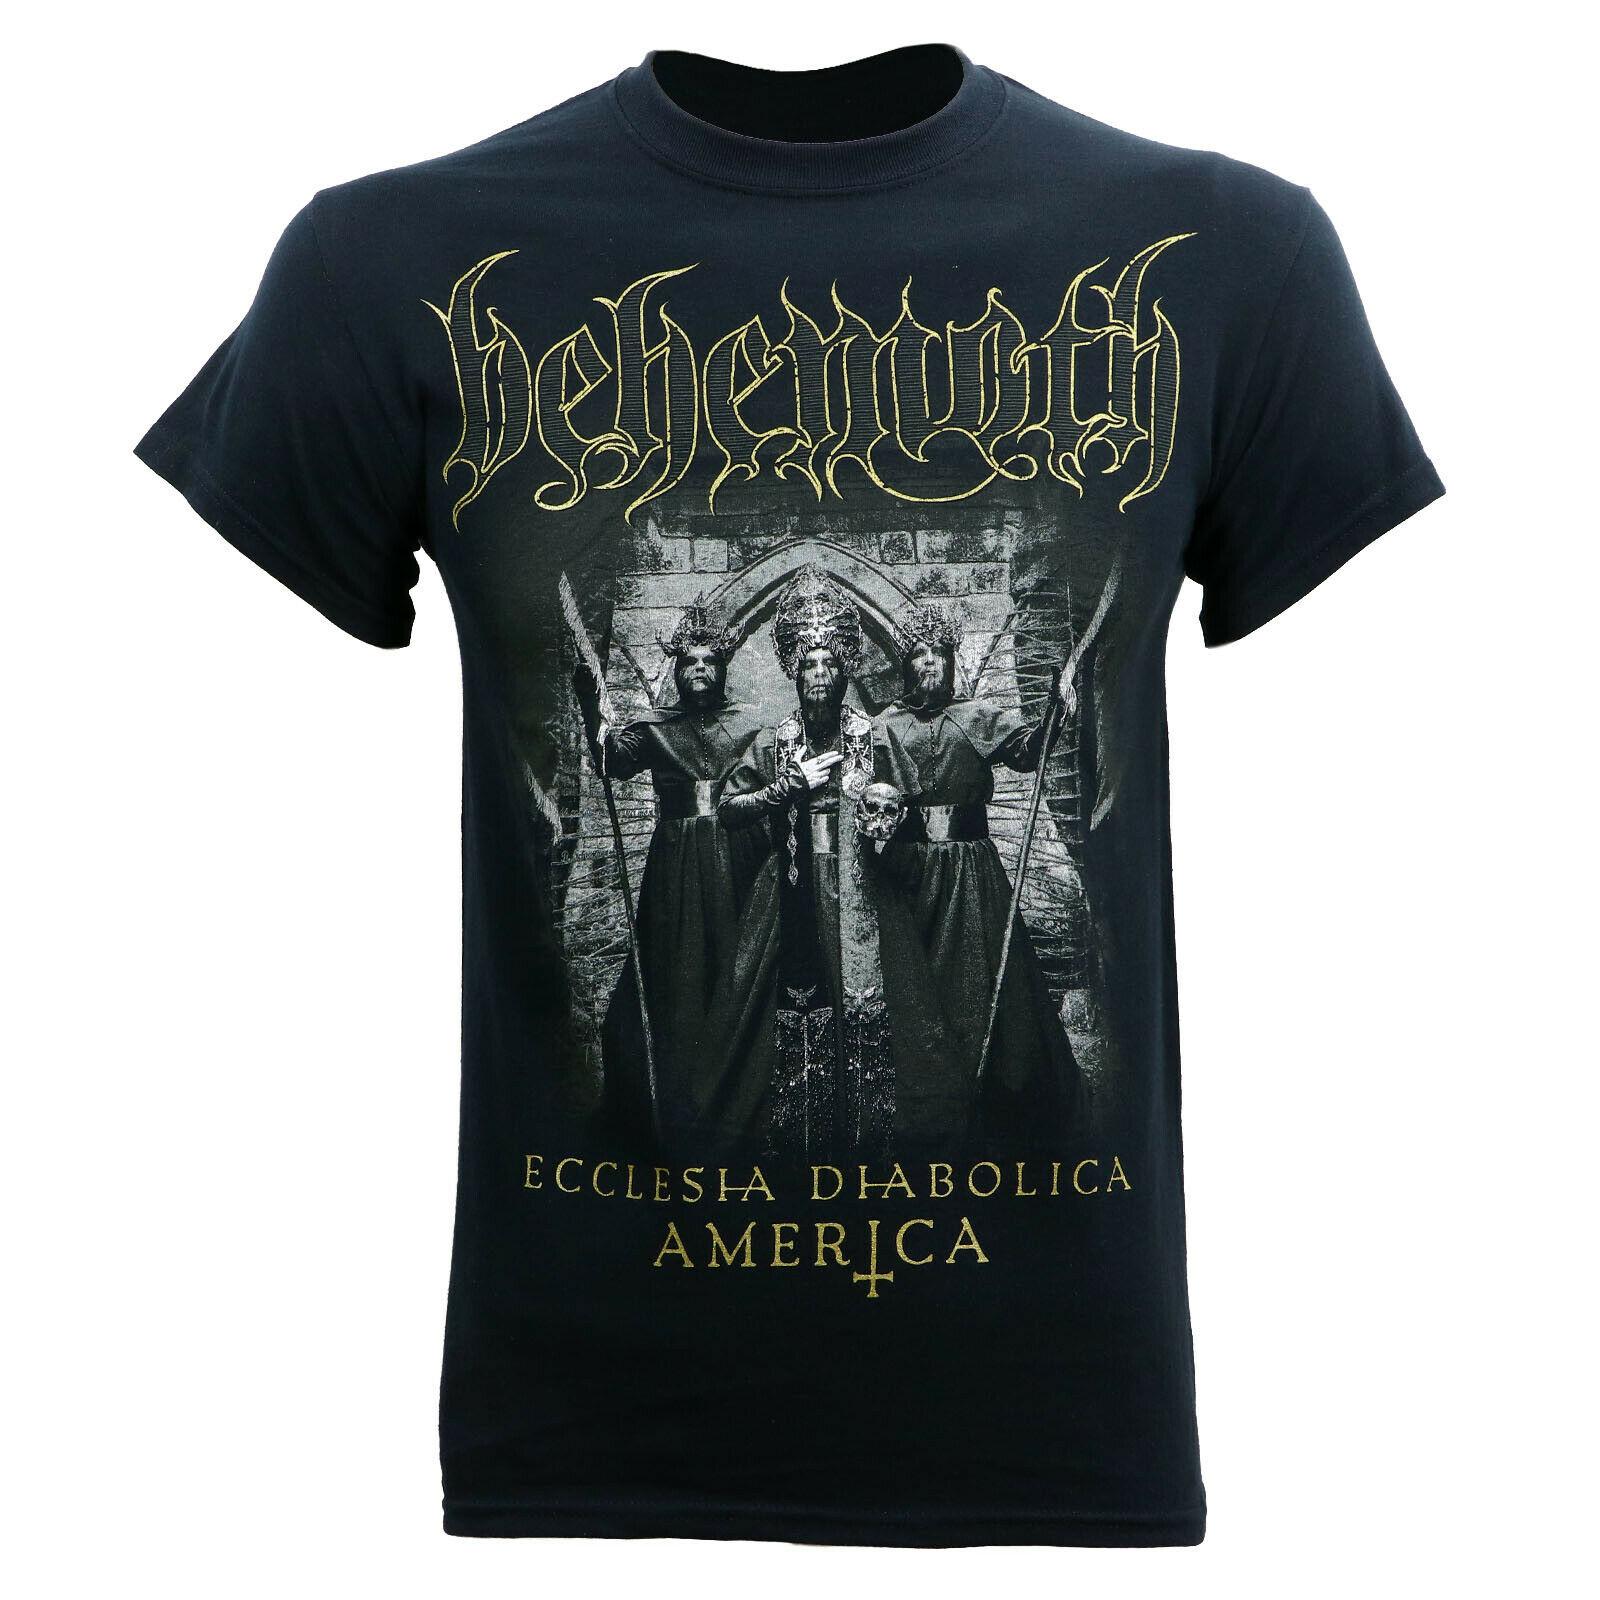 Authentic BEHEMOTH Ecclesia Diabolica America Tour T-Shirt S-3XL NEW